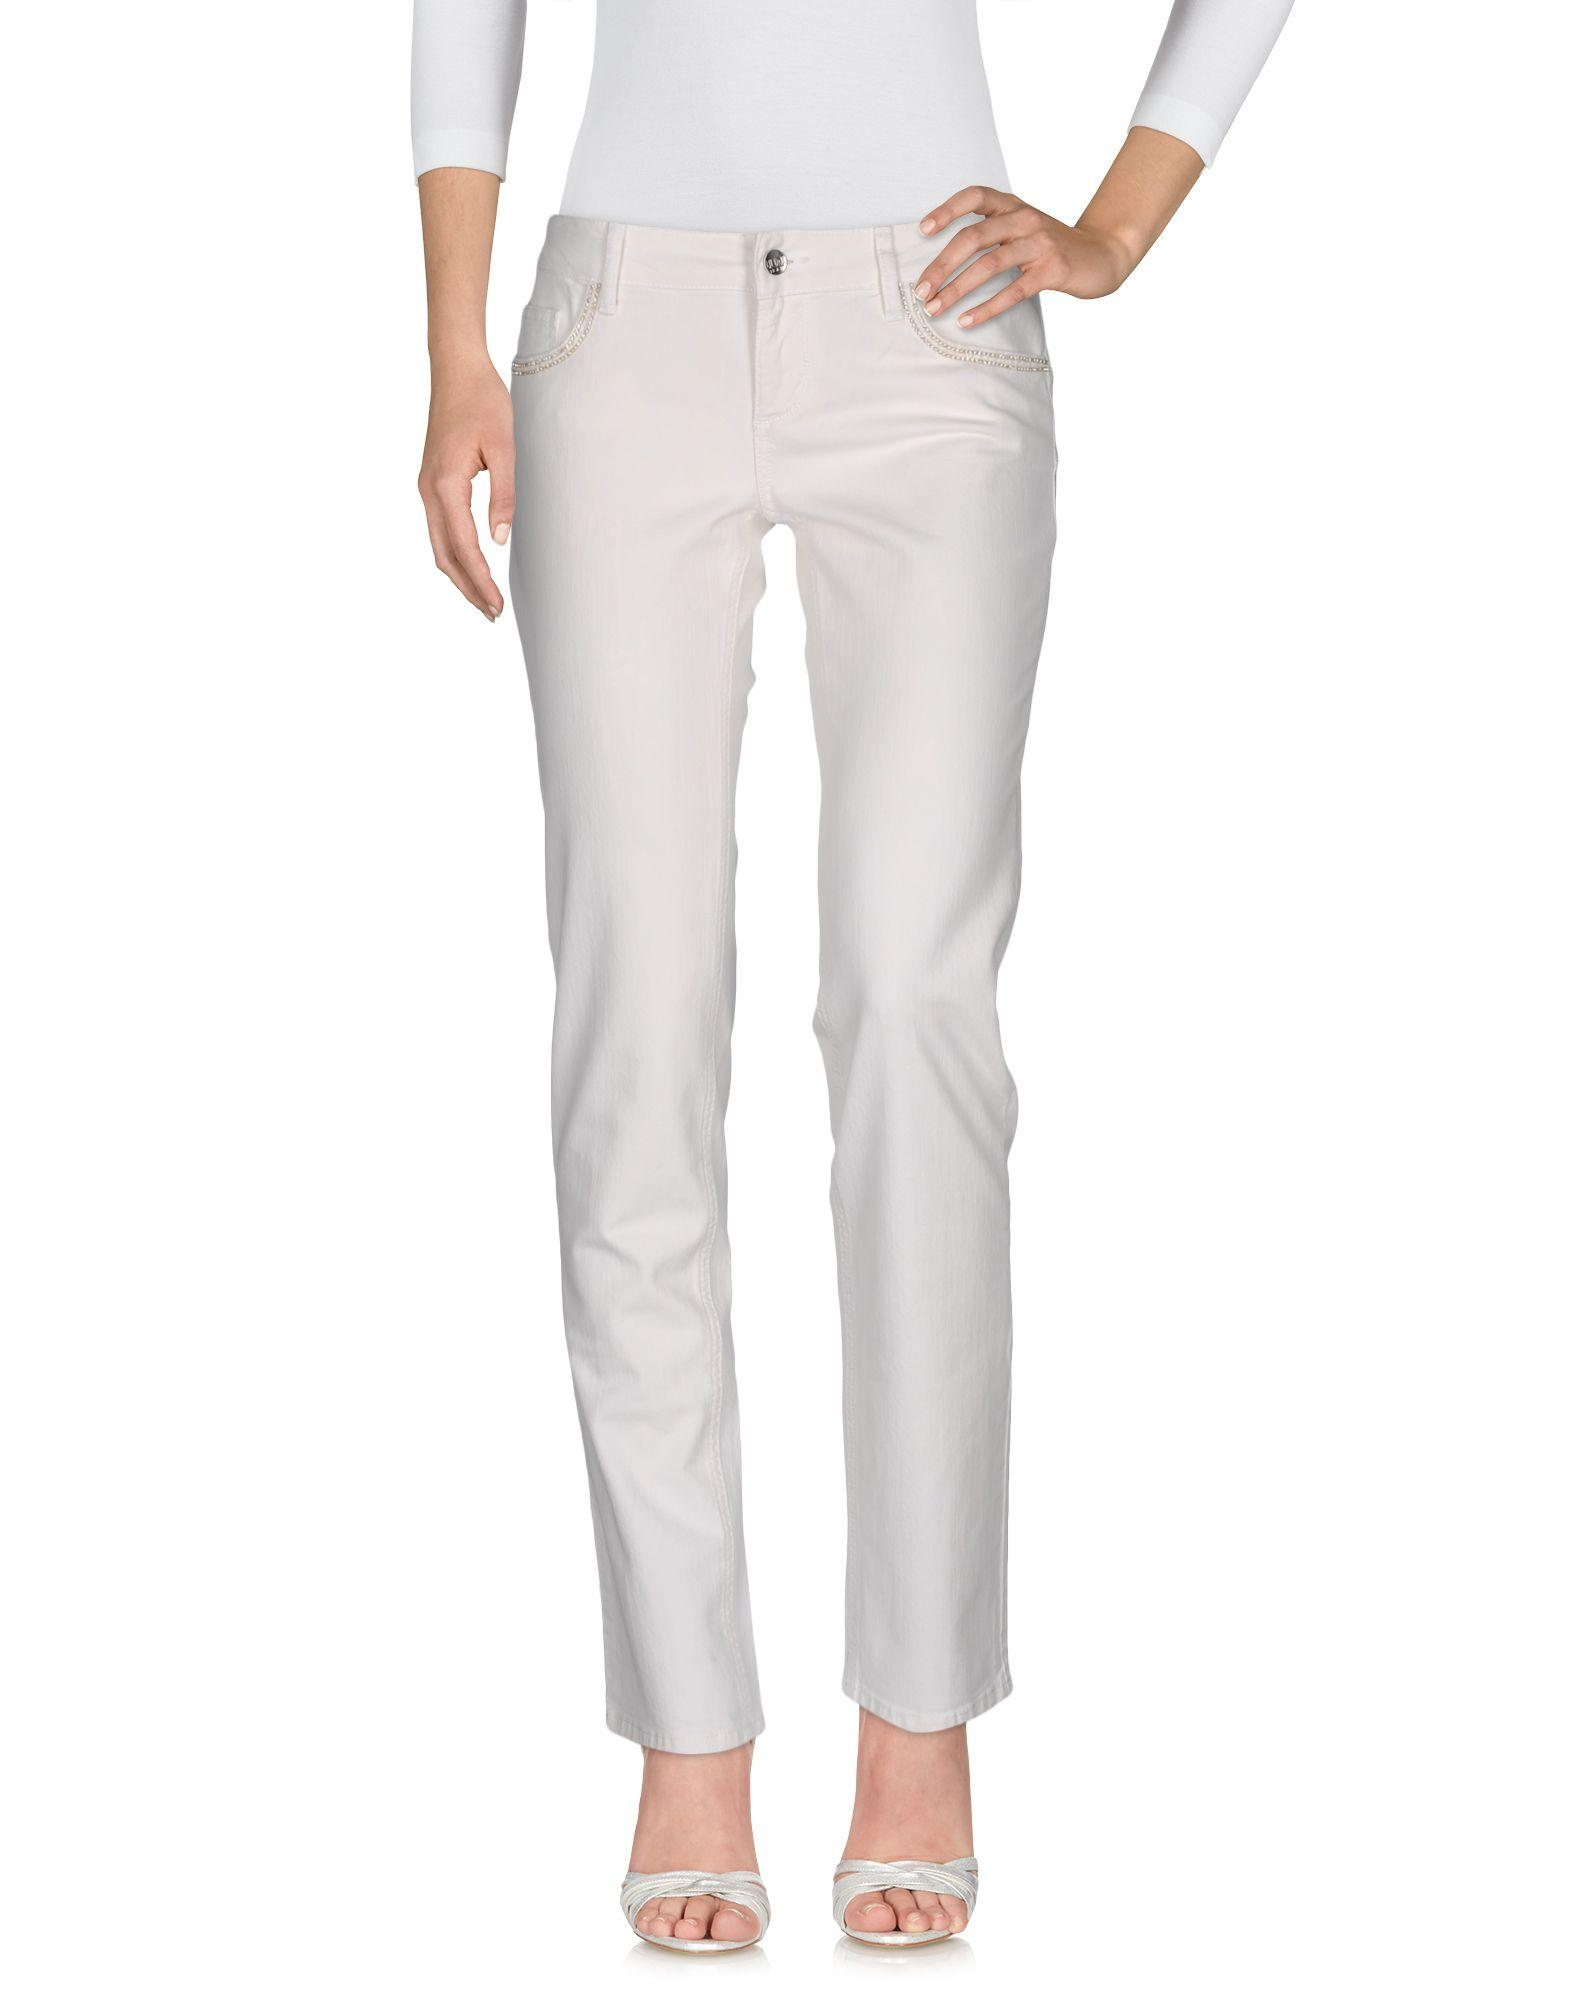 Liu •jo Jeans In White